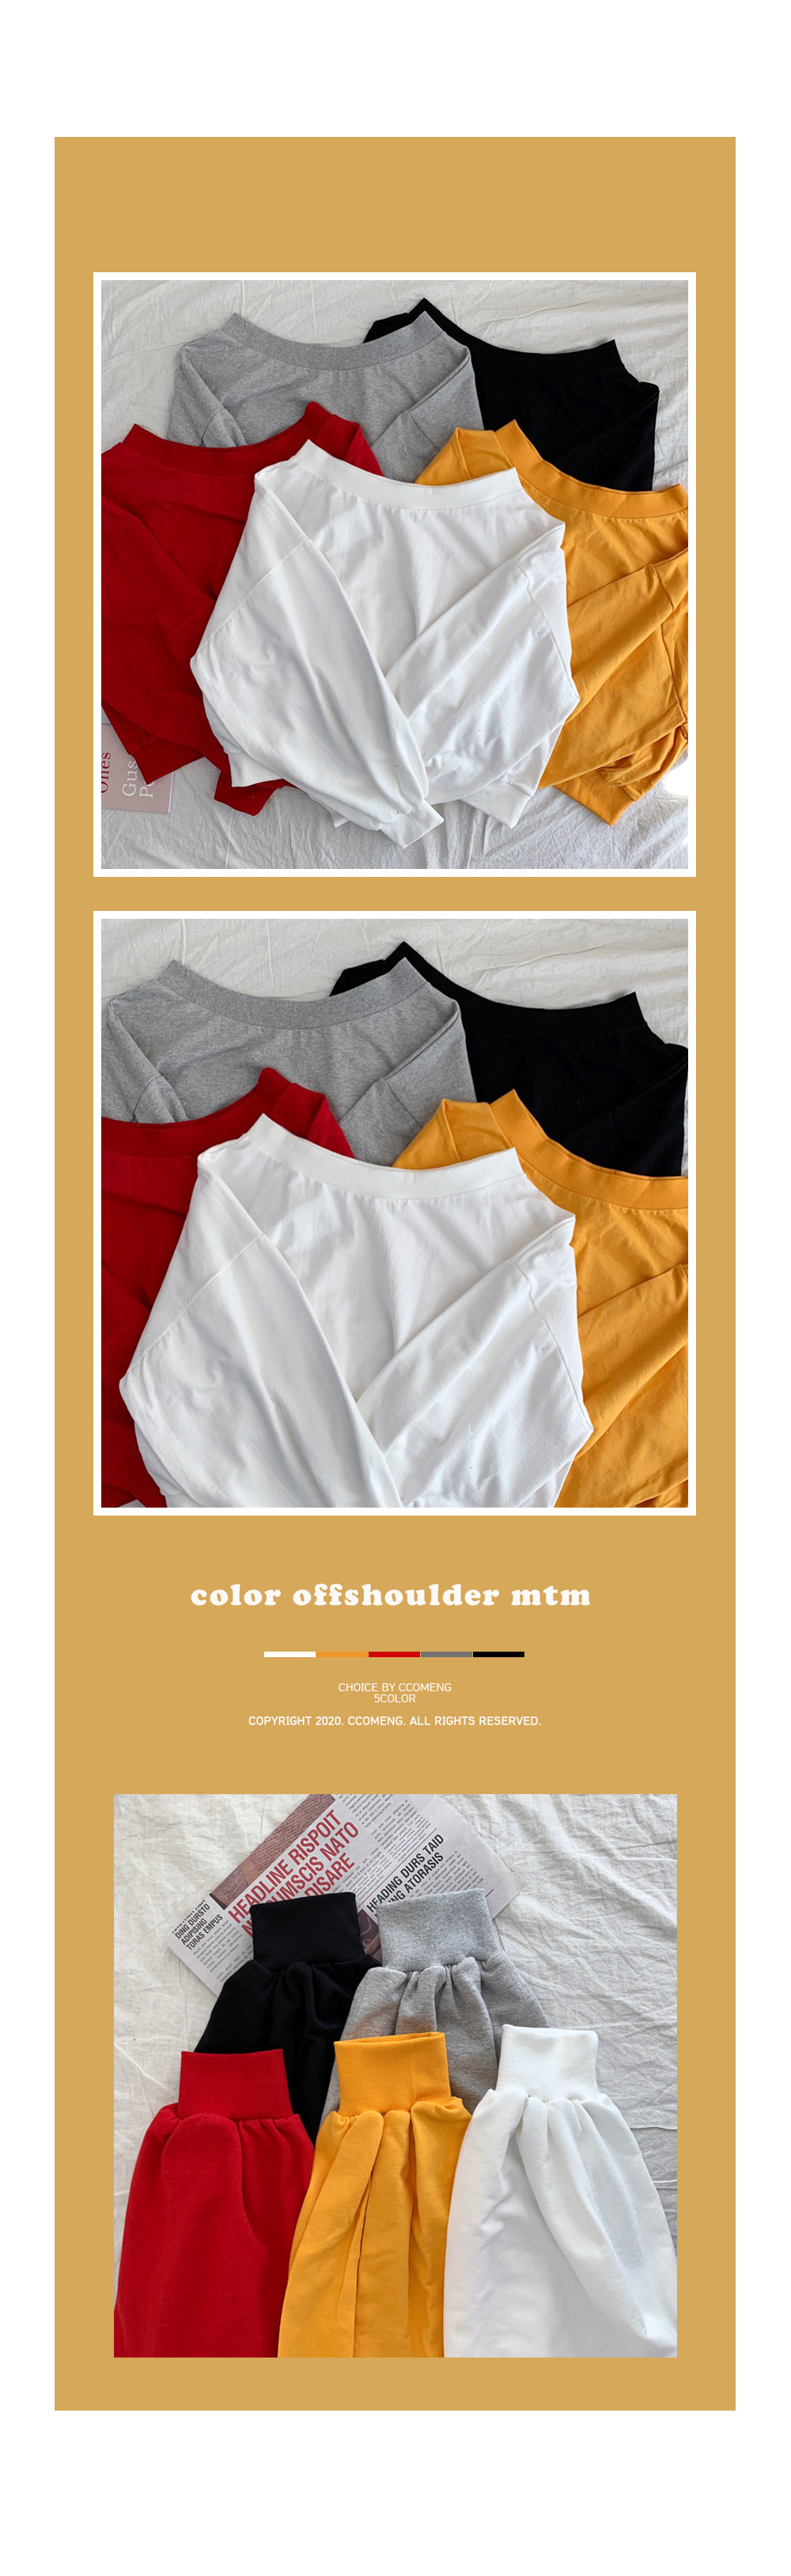 Muji Off Shoulder Sweatshirt